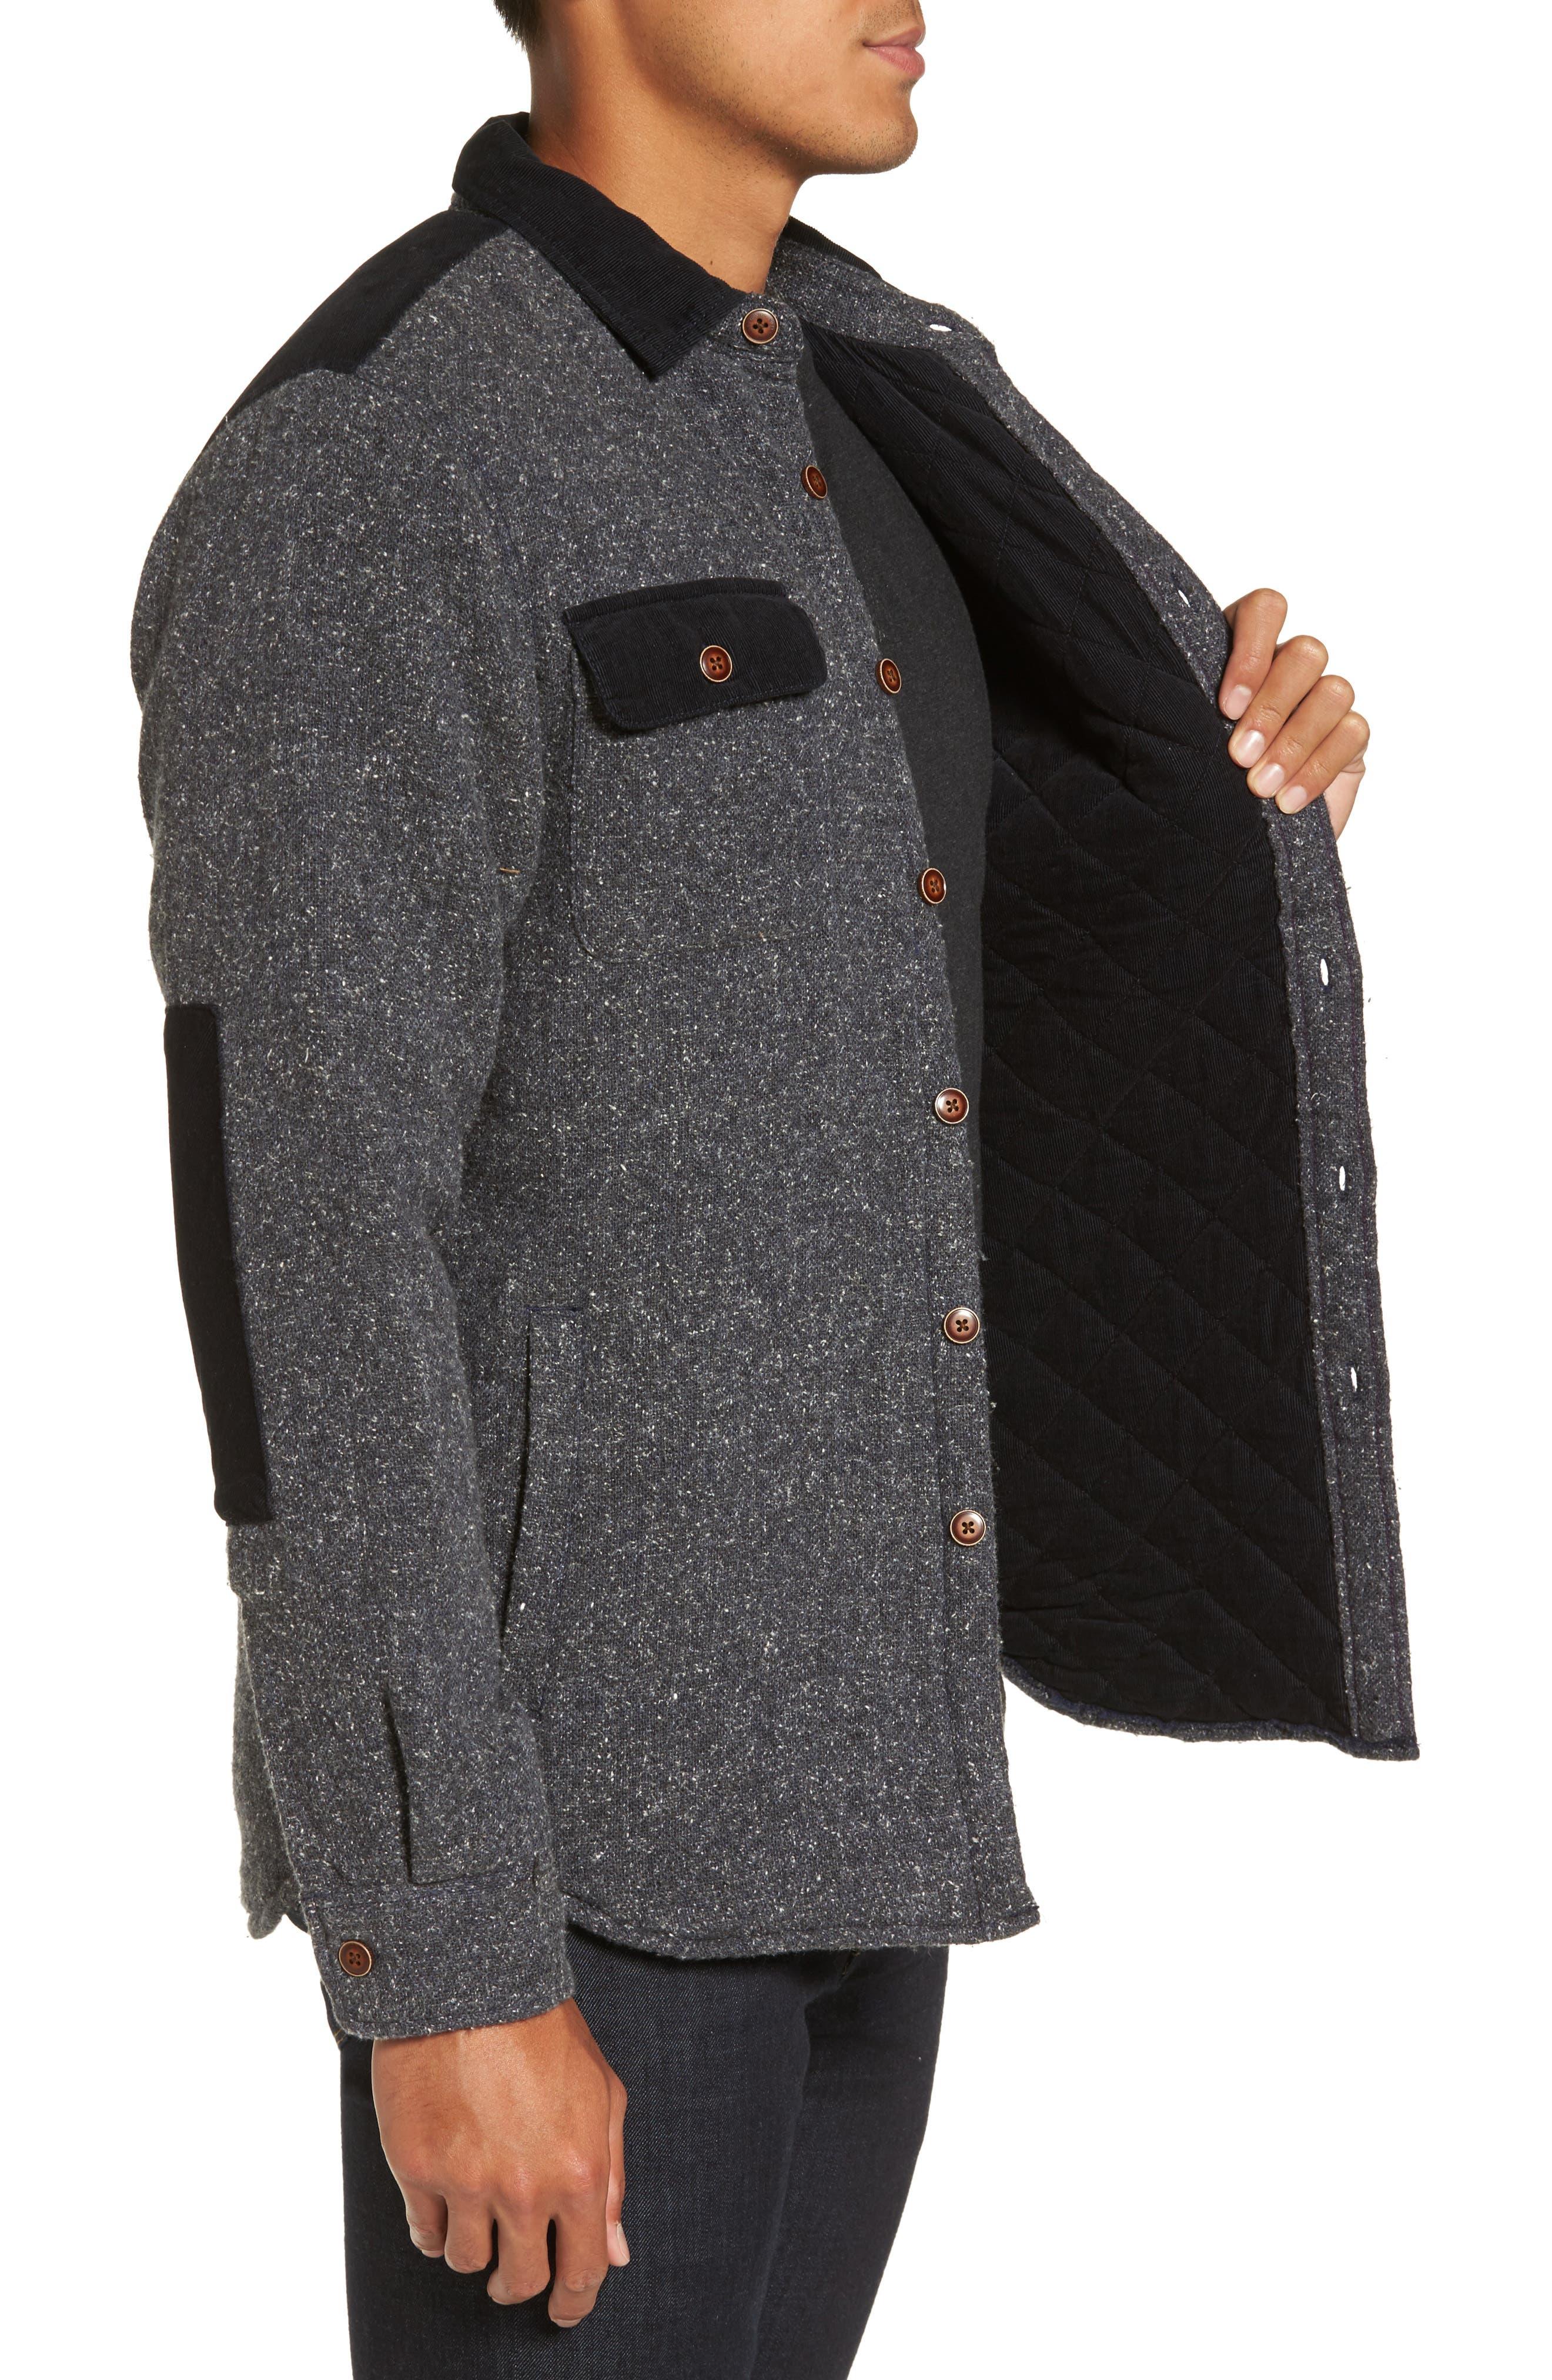 Alternate Image 2  - Nifty Genius CPO Shirt Jacket